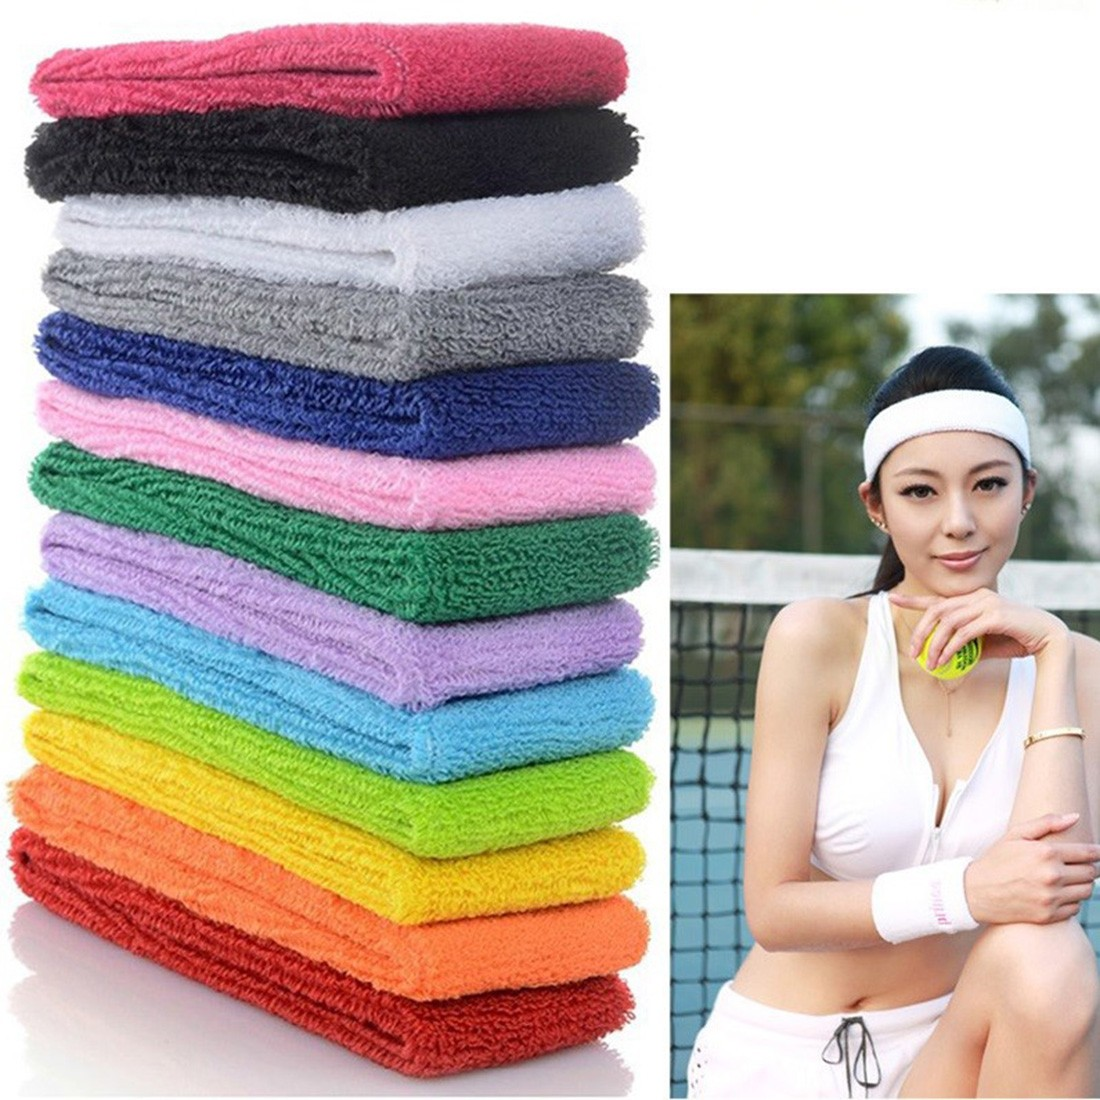 Sports Yoga Gym Stretch Headband Head Band Hair Band Sweat Sweatband Mens Women